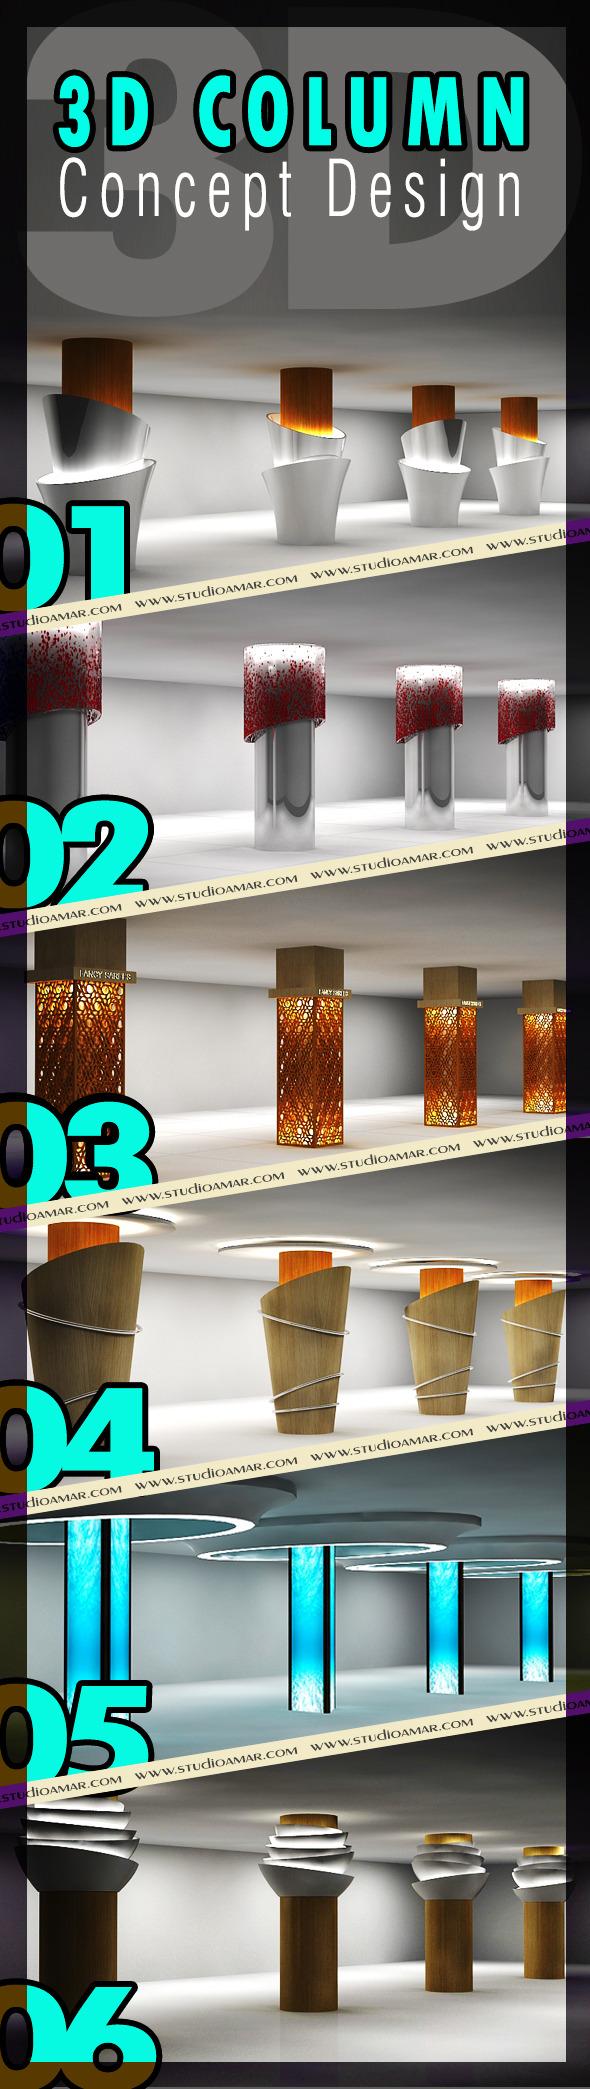 3D Column Concept Design 124 - 3DOcean Item for Sale